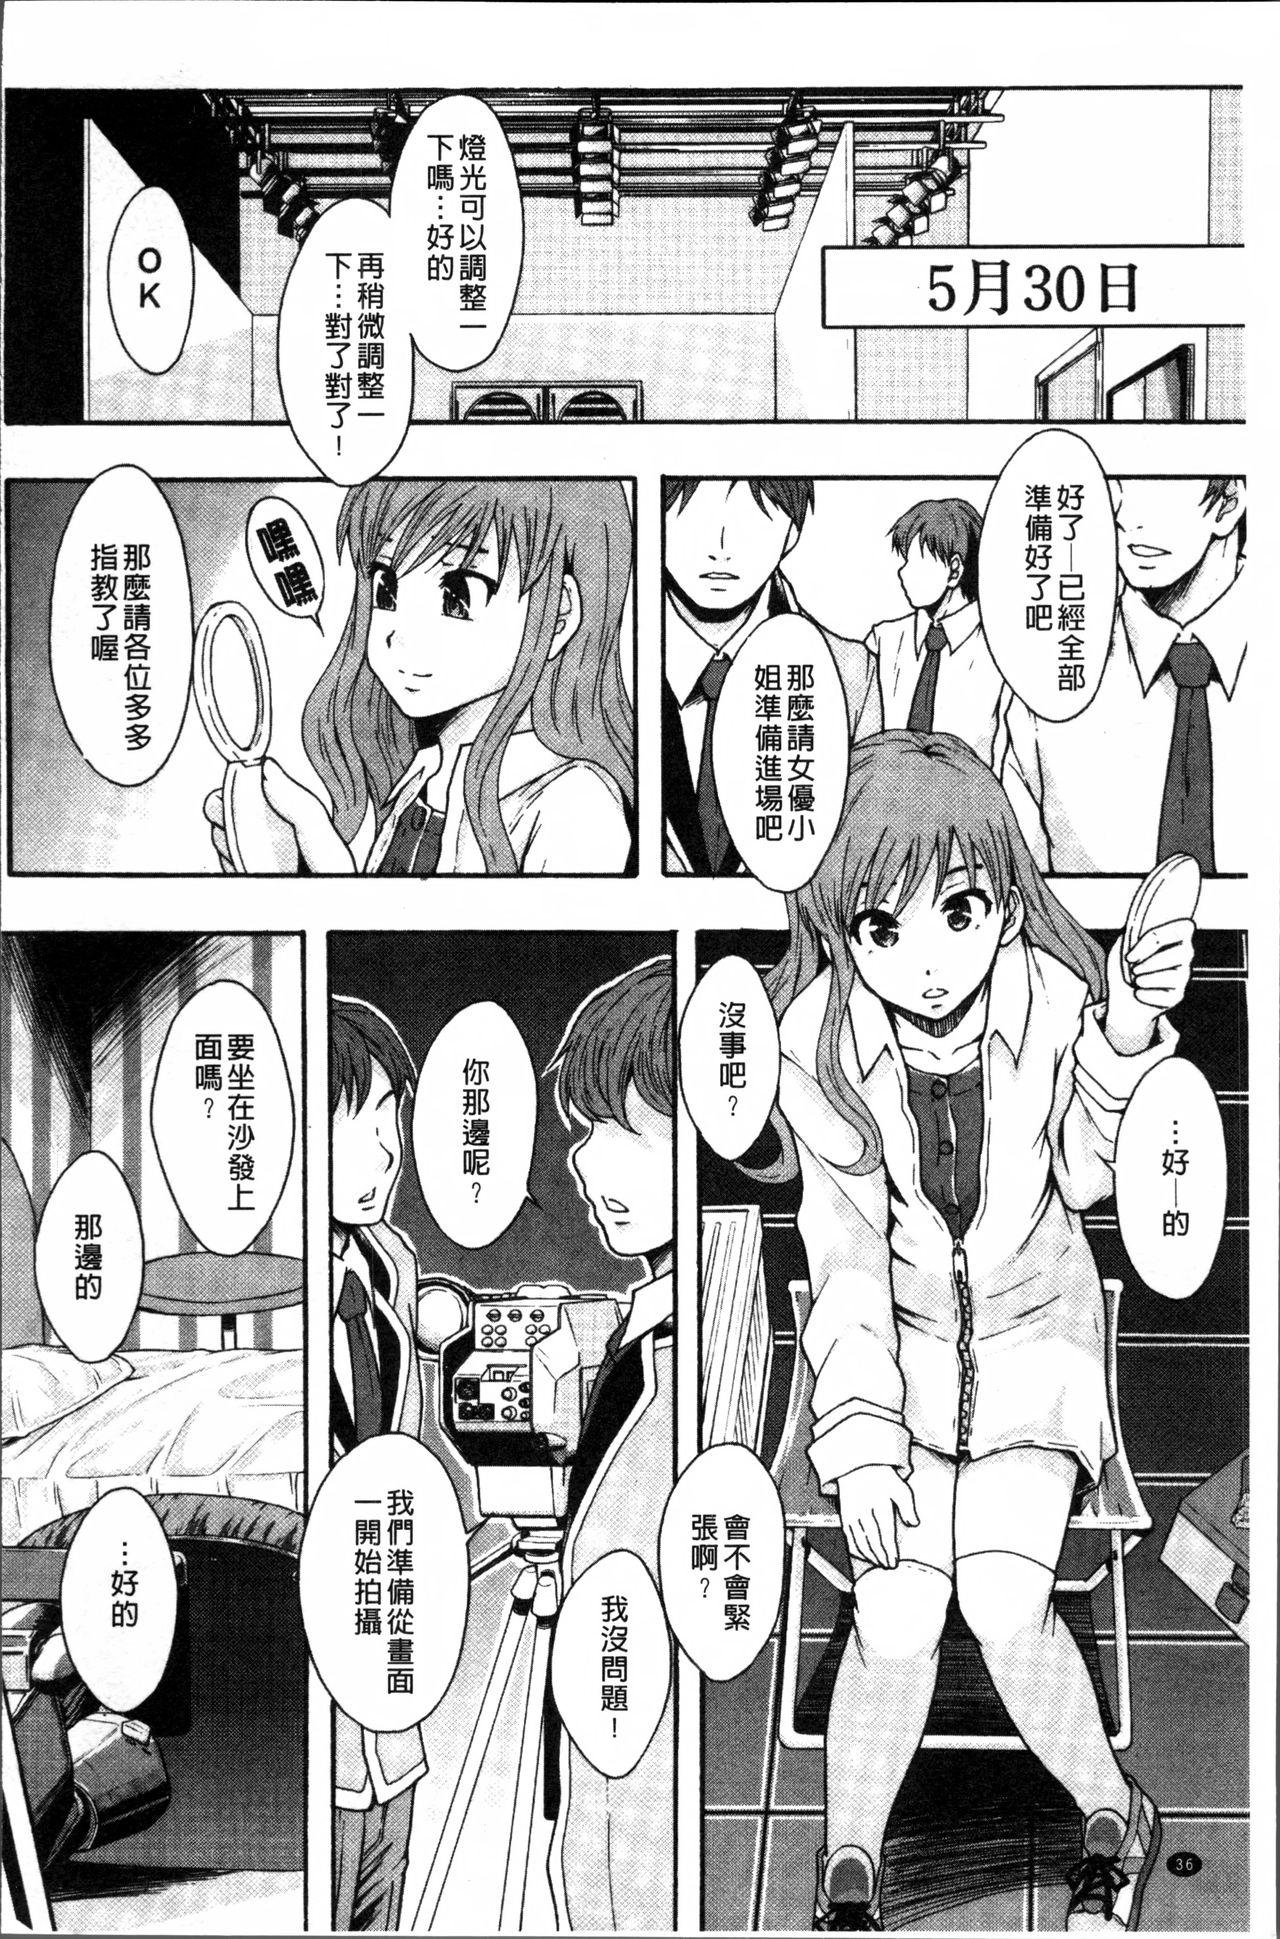 Anoko no Class wa AV-ka 38